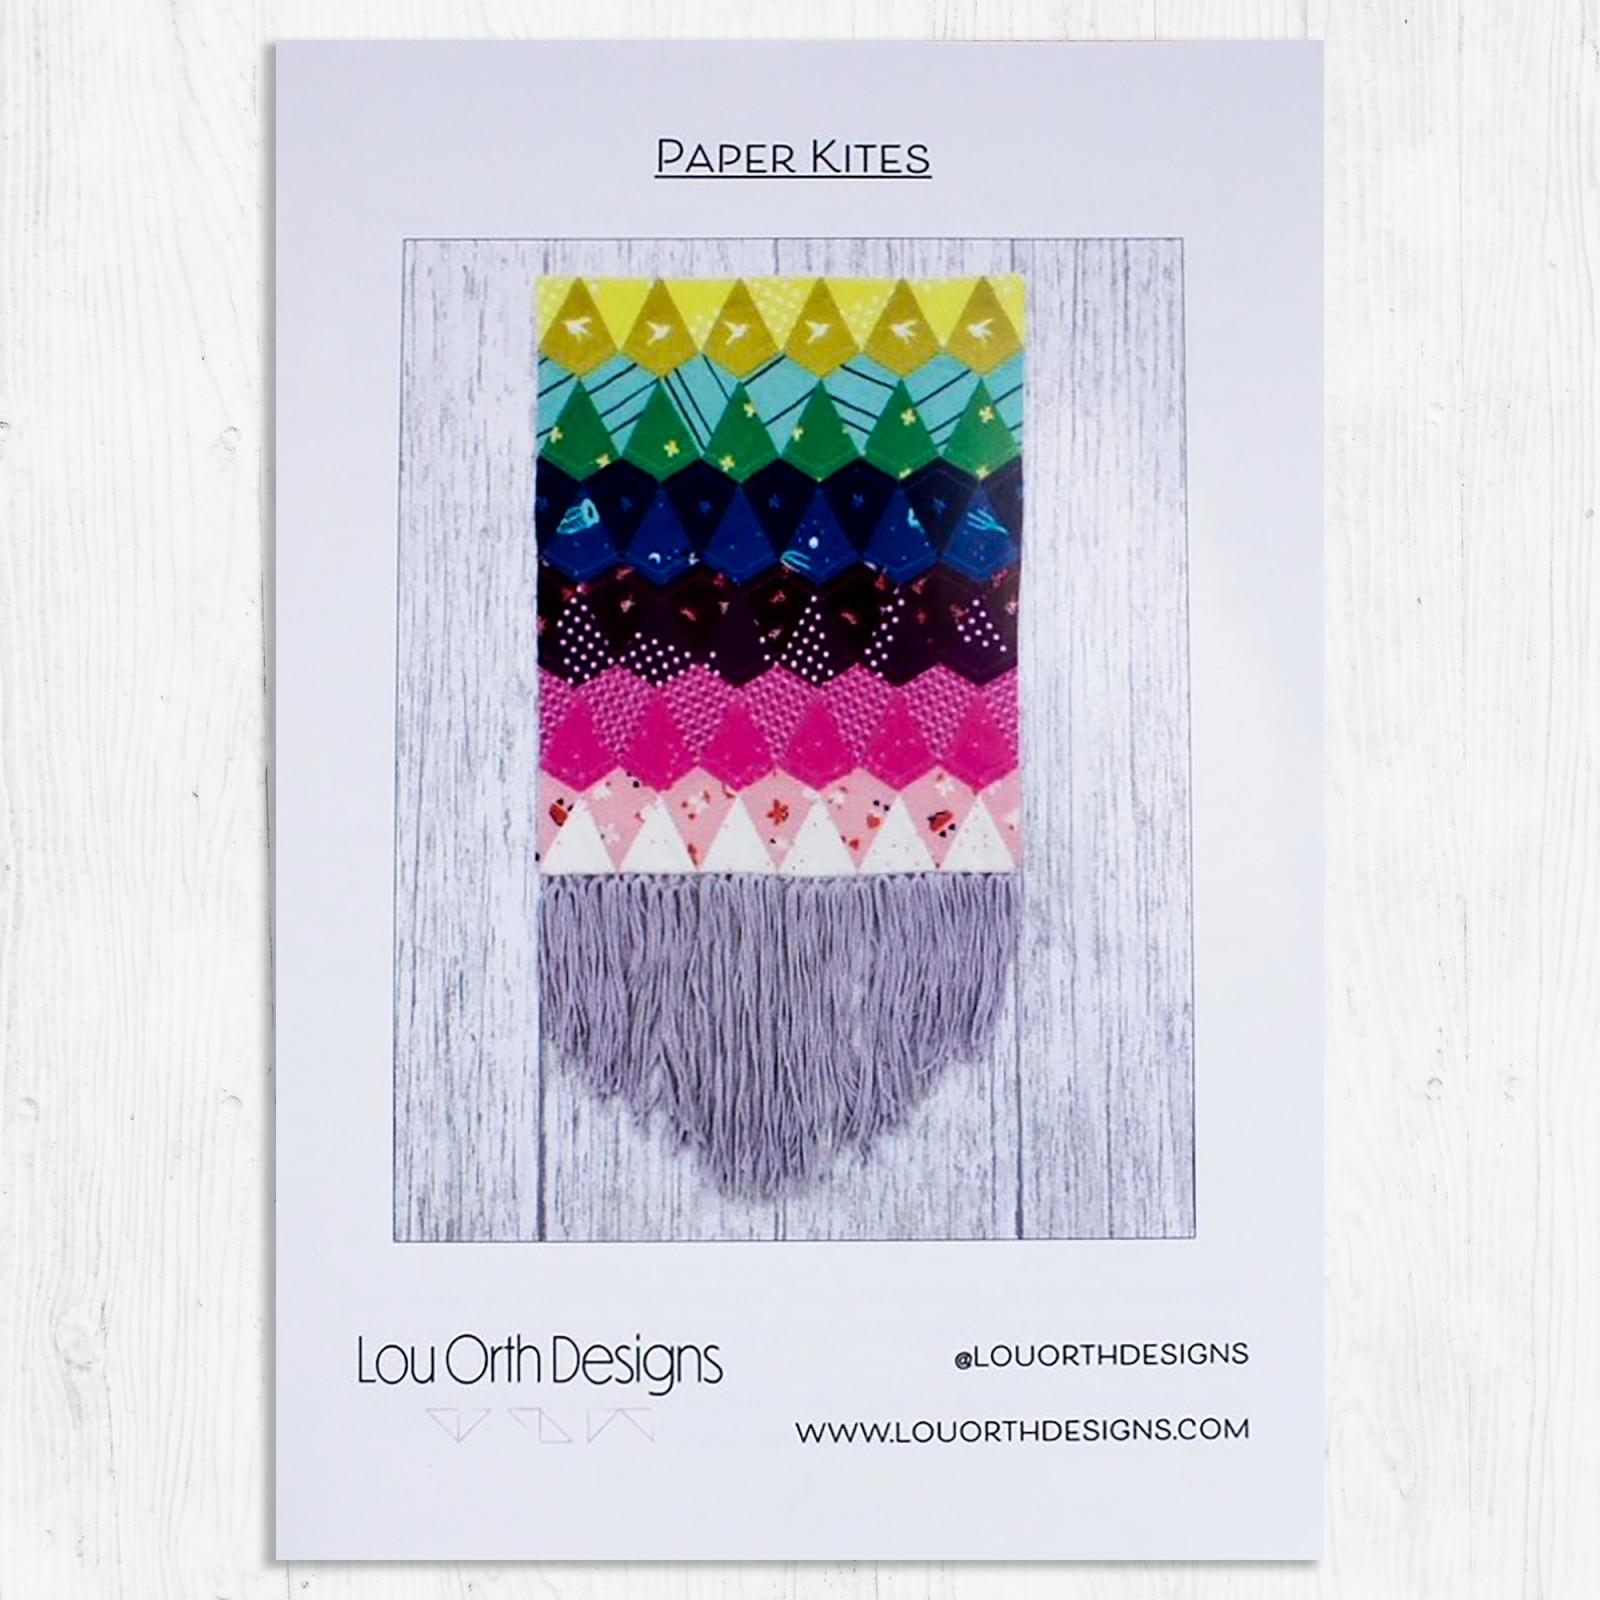 Lou Orth Designs - Paper Kites - EPP Pattern